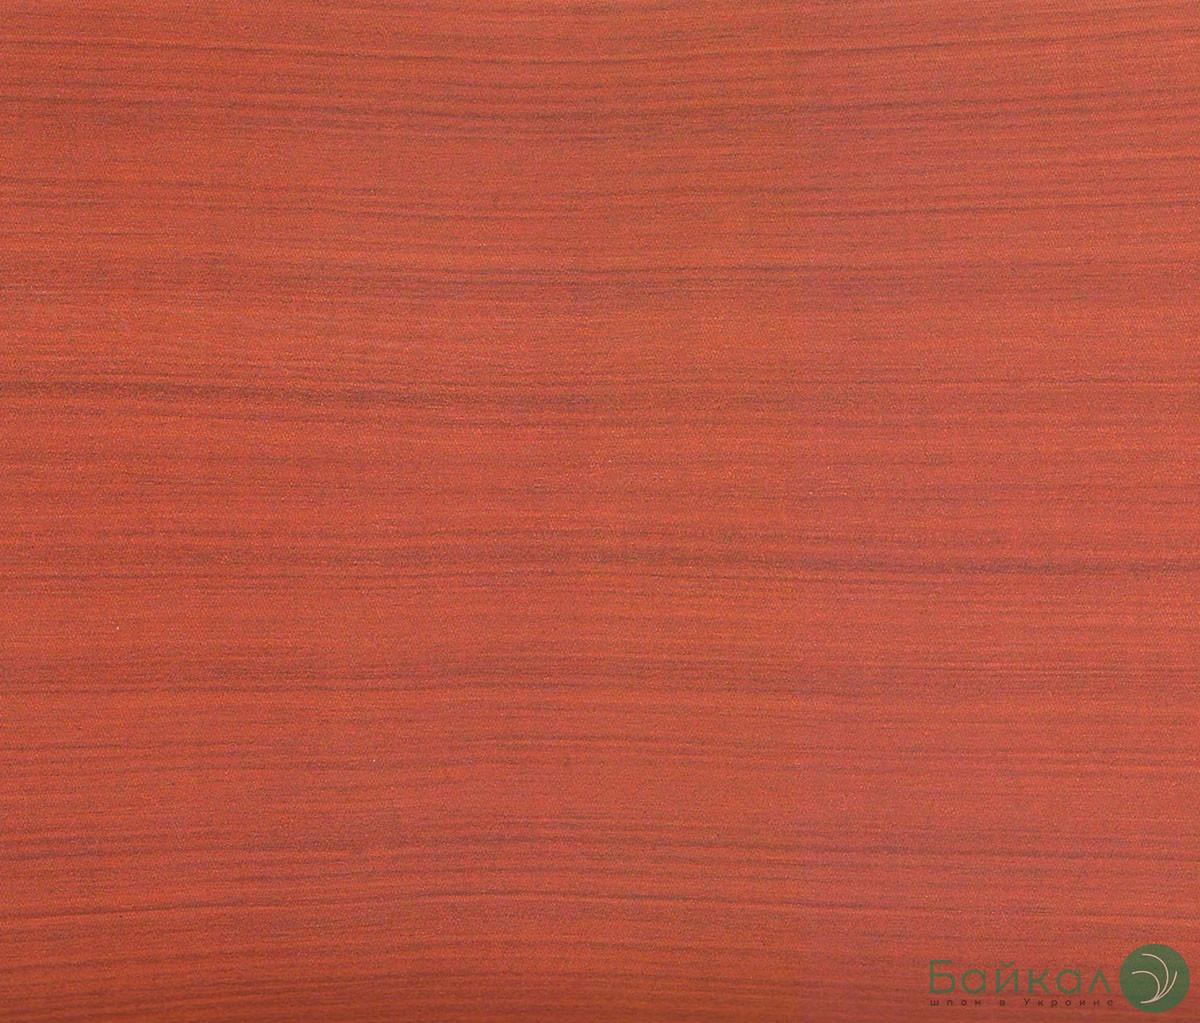 Шпон Макоре (строганный) 0,55 мм B сорт - 2,10 м+/9 см+